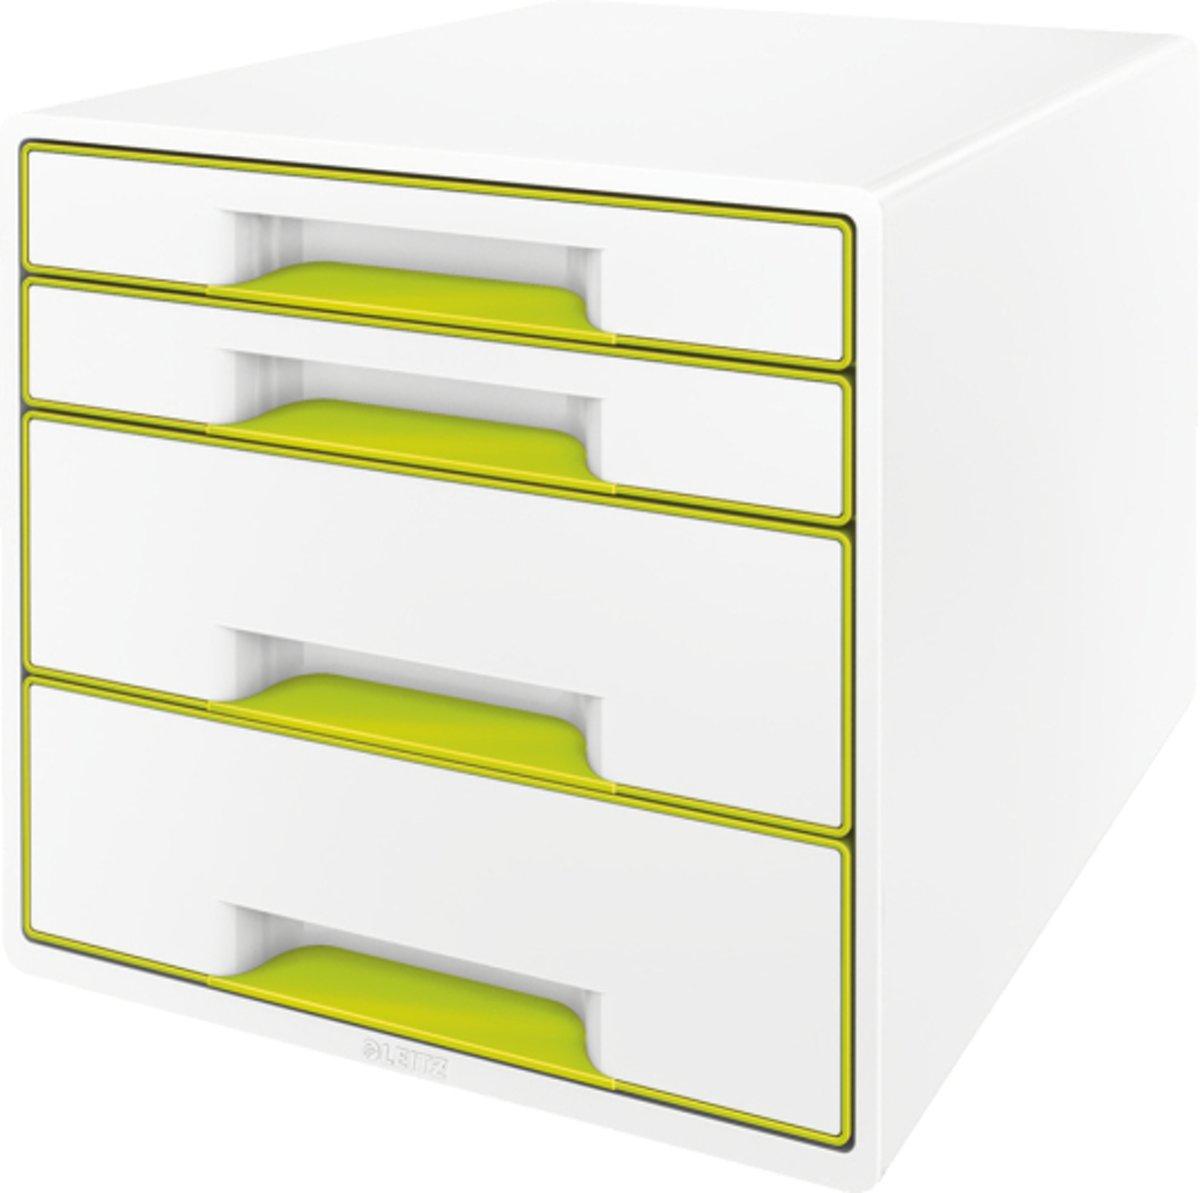 HAN Ladebox IMPULS 2.0 1013-56 Wit DIN A4, DIN C4 Aantal lades: 4